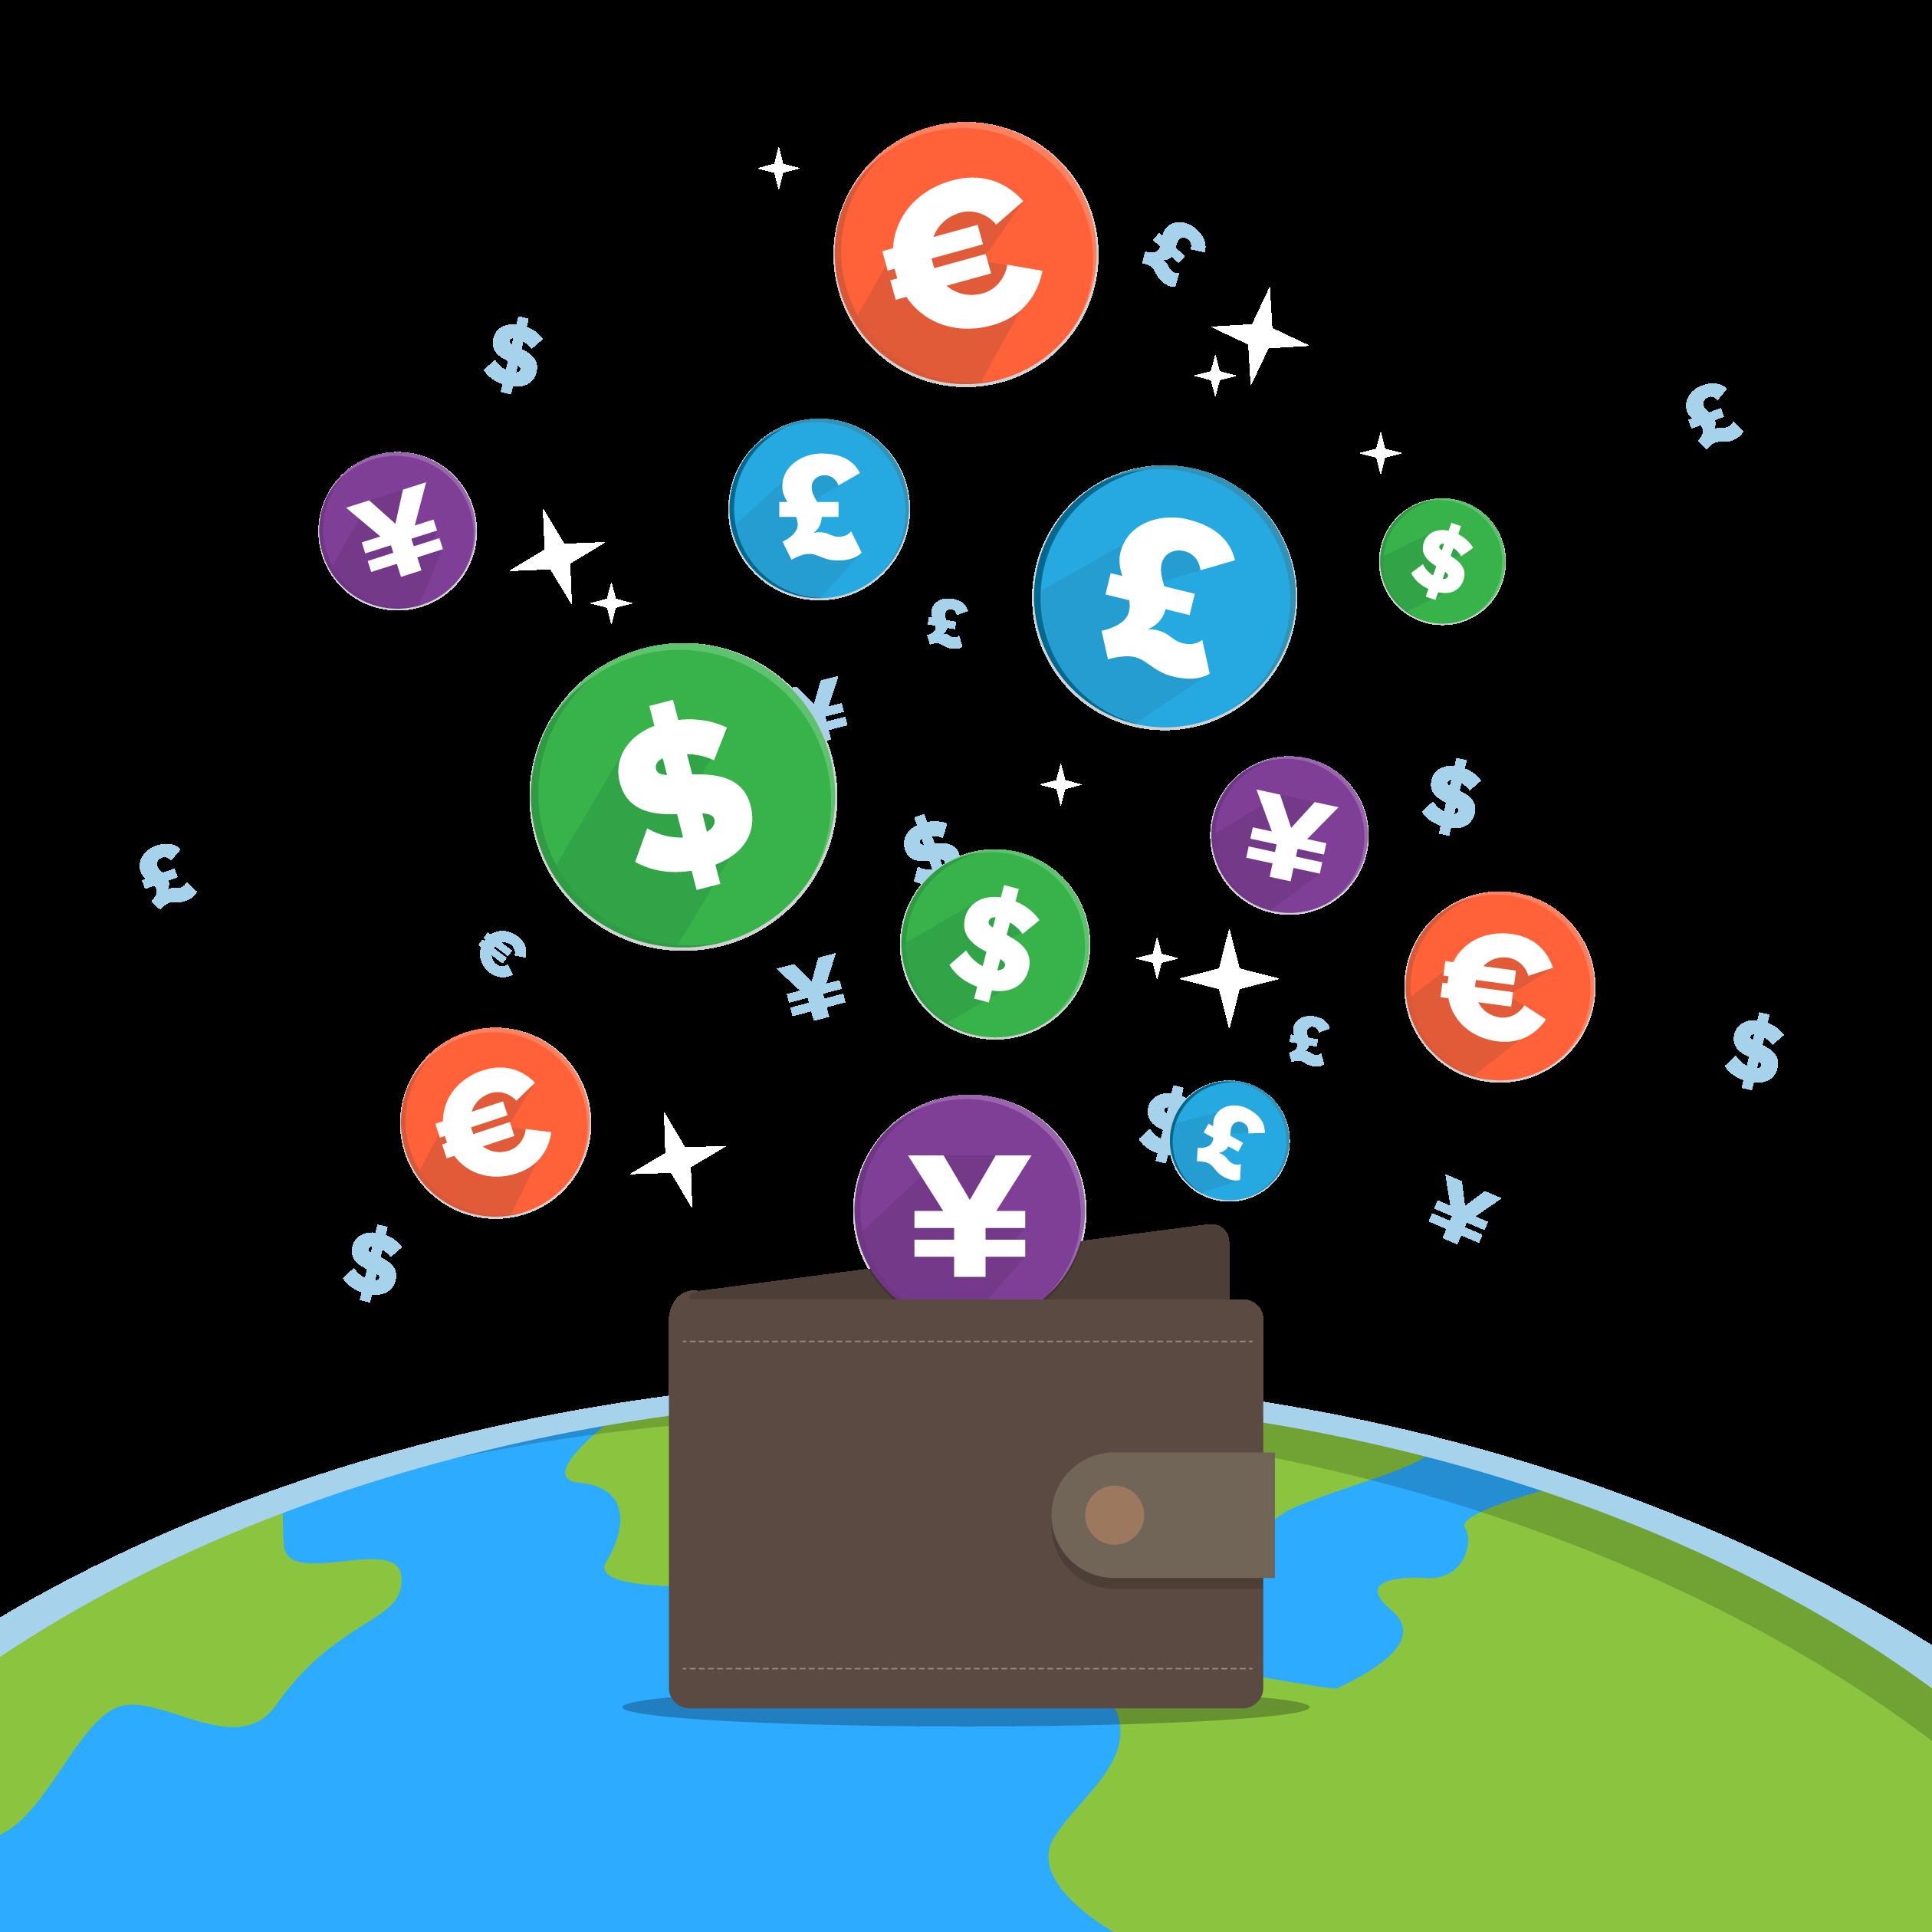 Money and personnel clipart business clipart transparent download Payment Business E-commerce Money Exchange rate - Creative wallet ... clipart transparent download